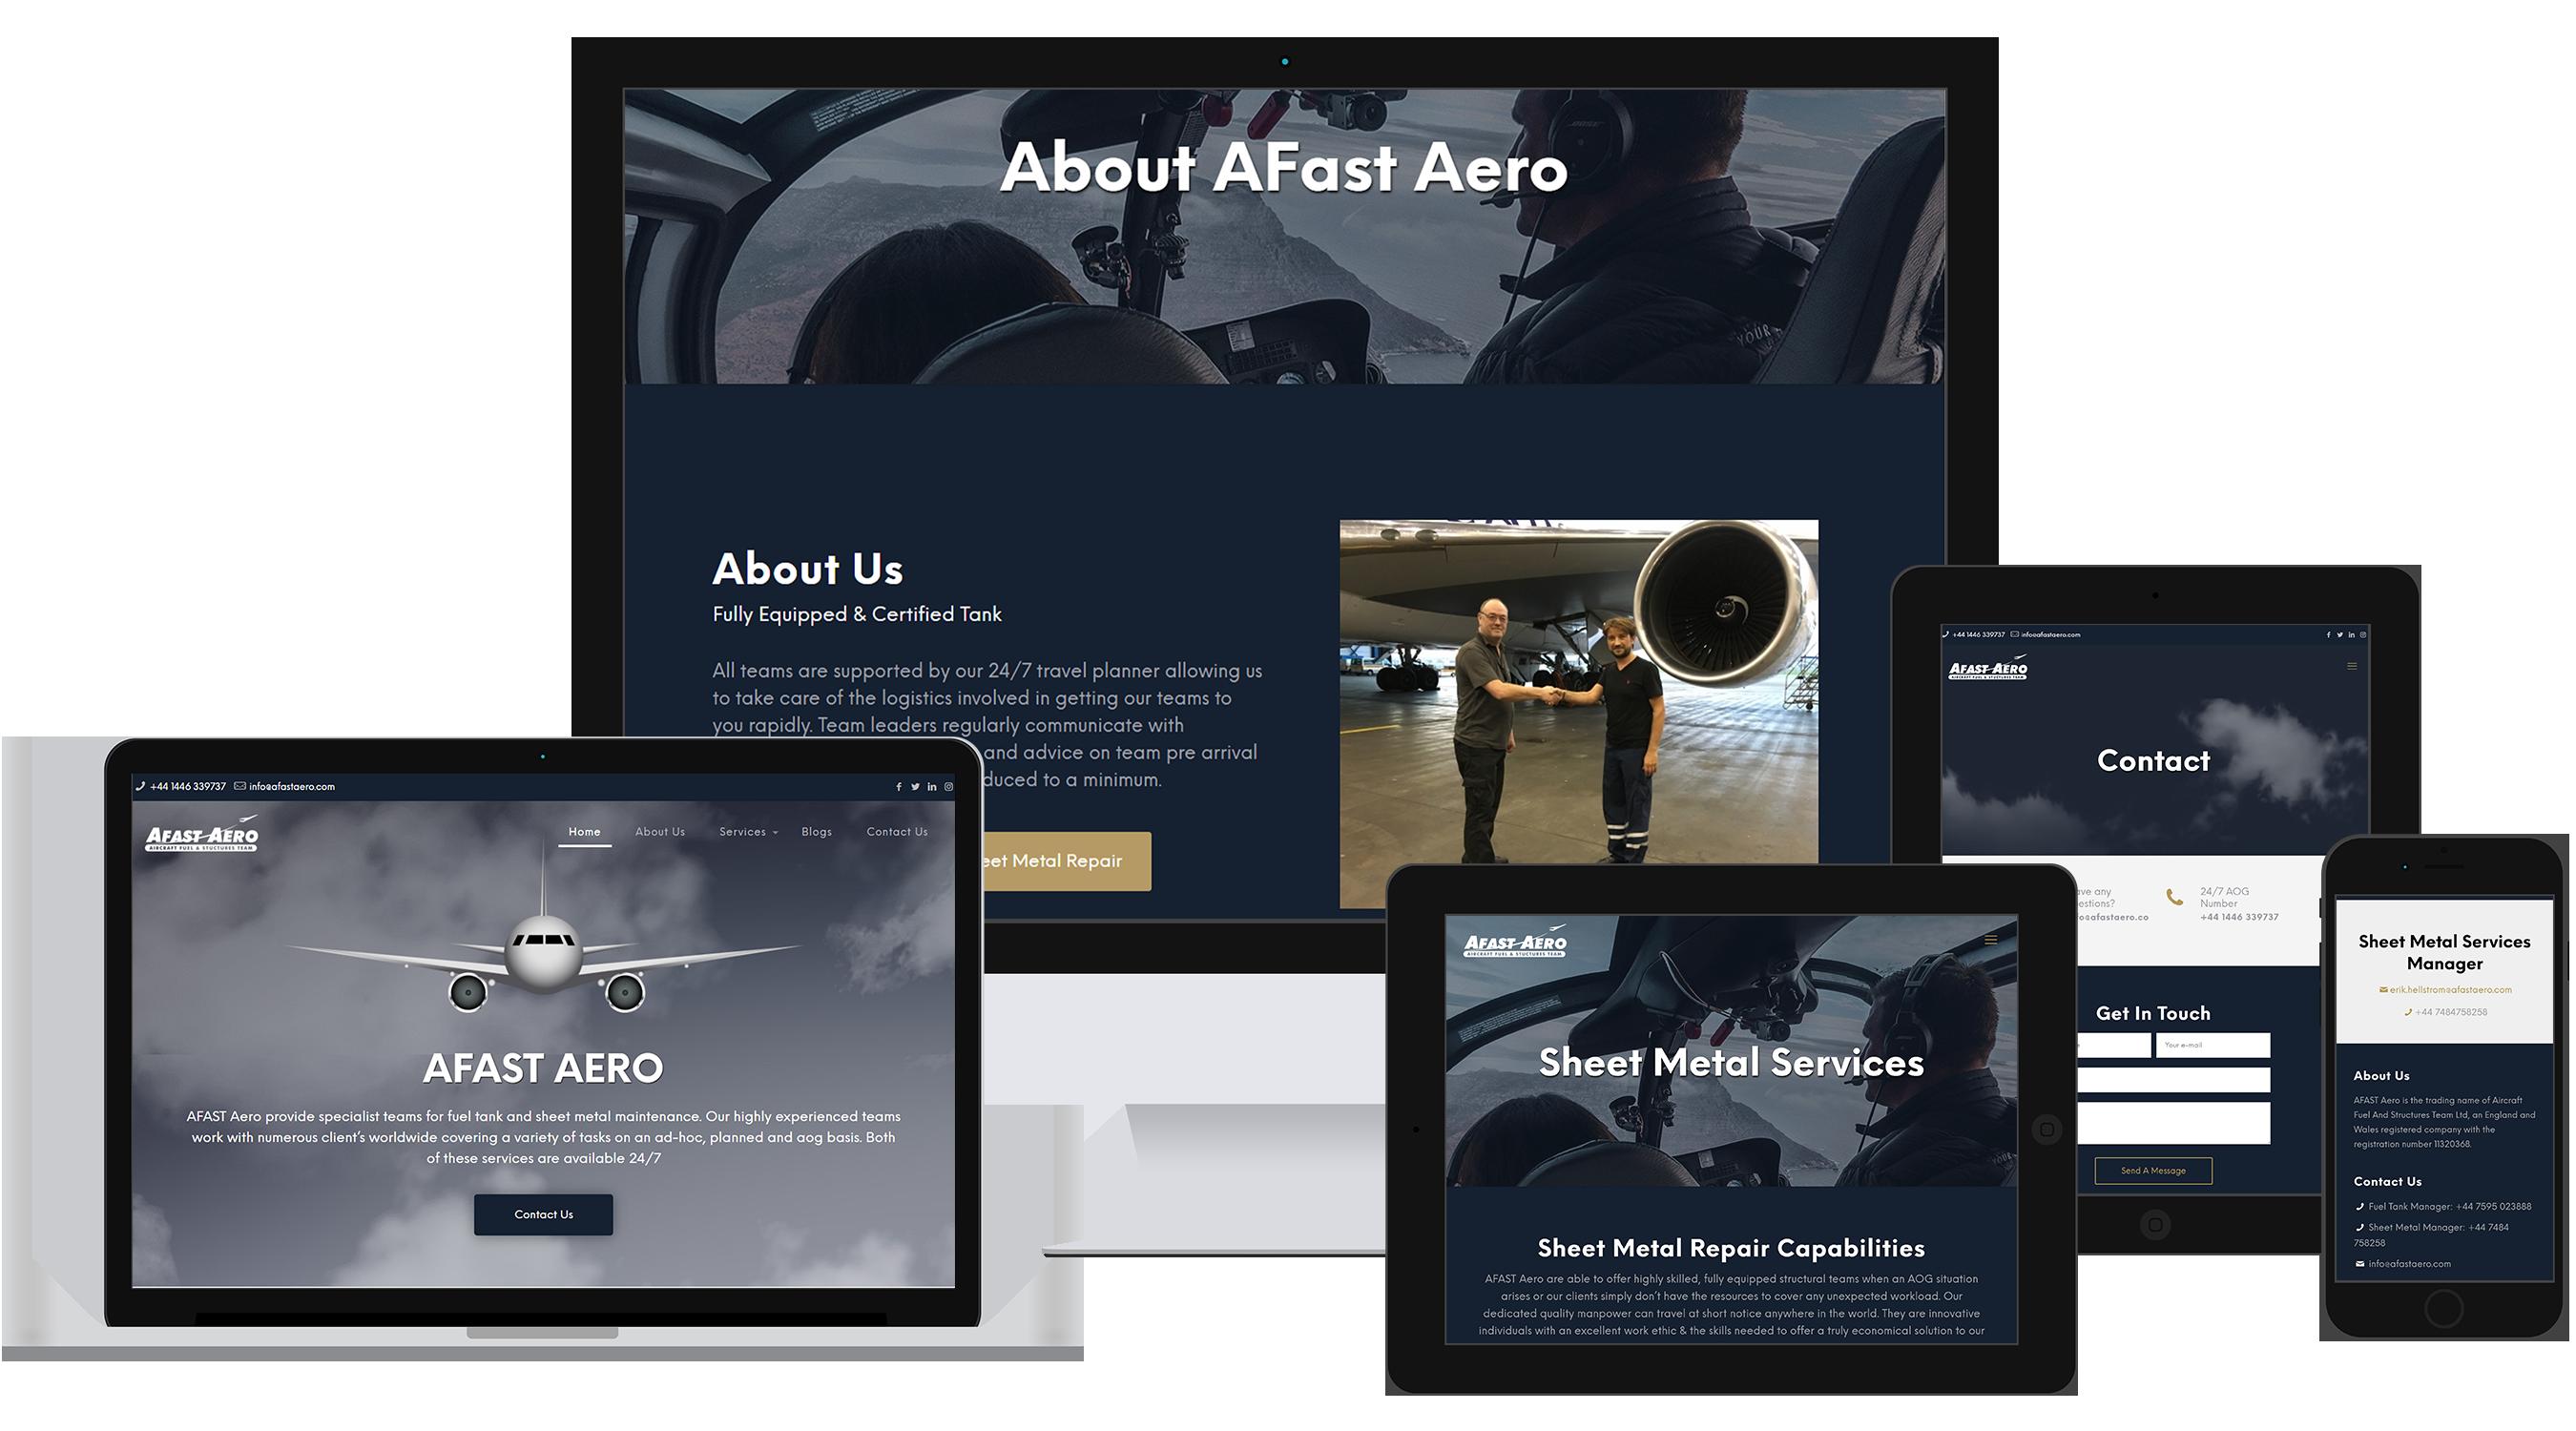 Afast-Aero-Devices-Mock-up